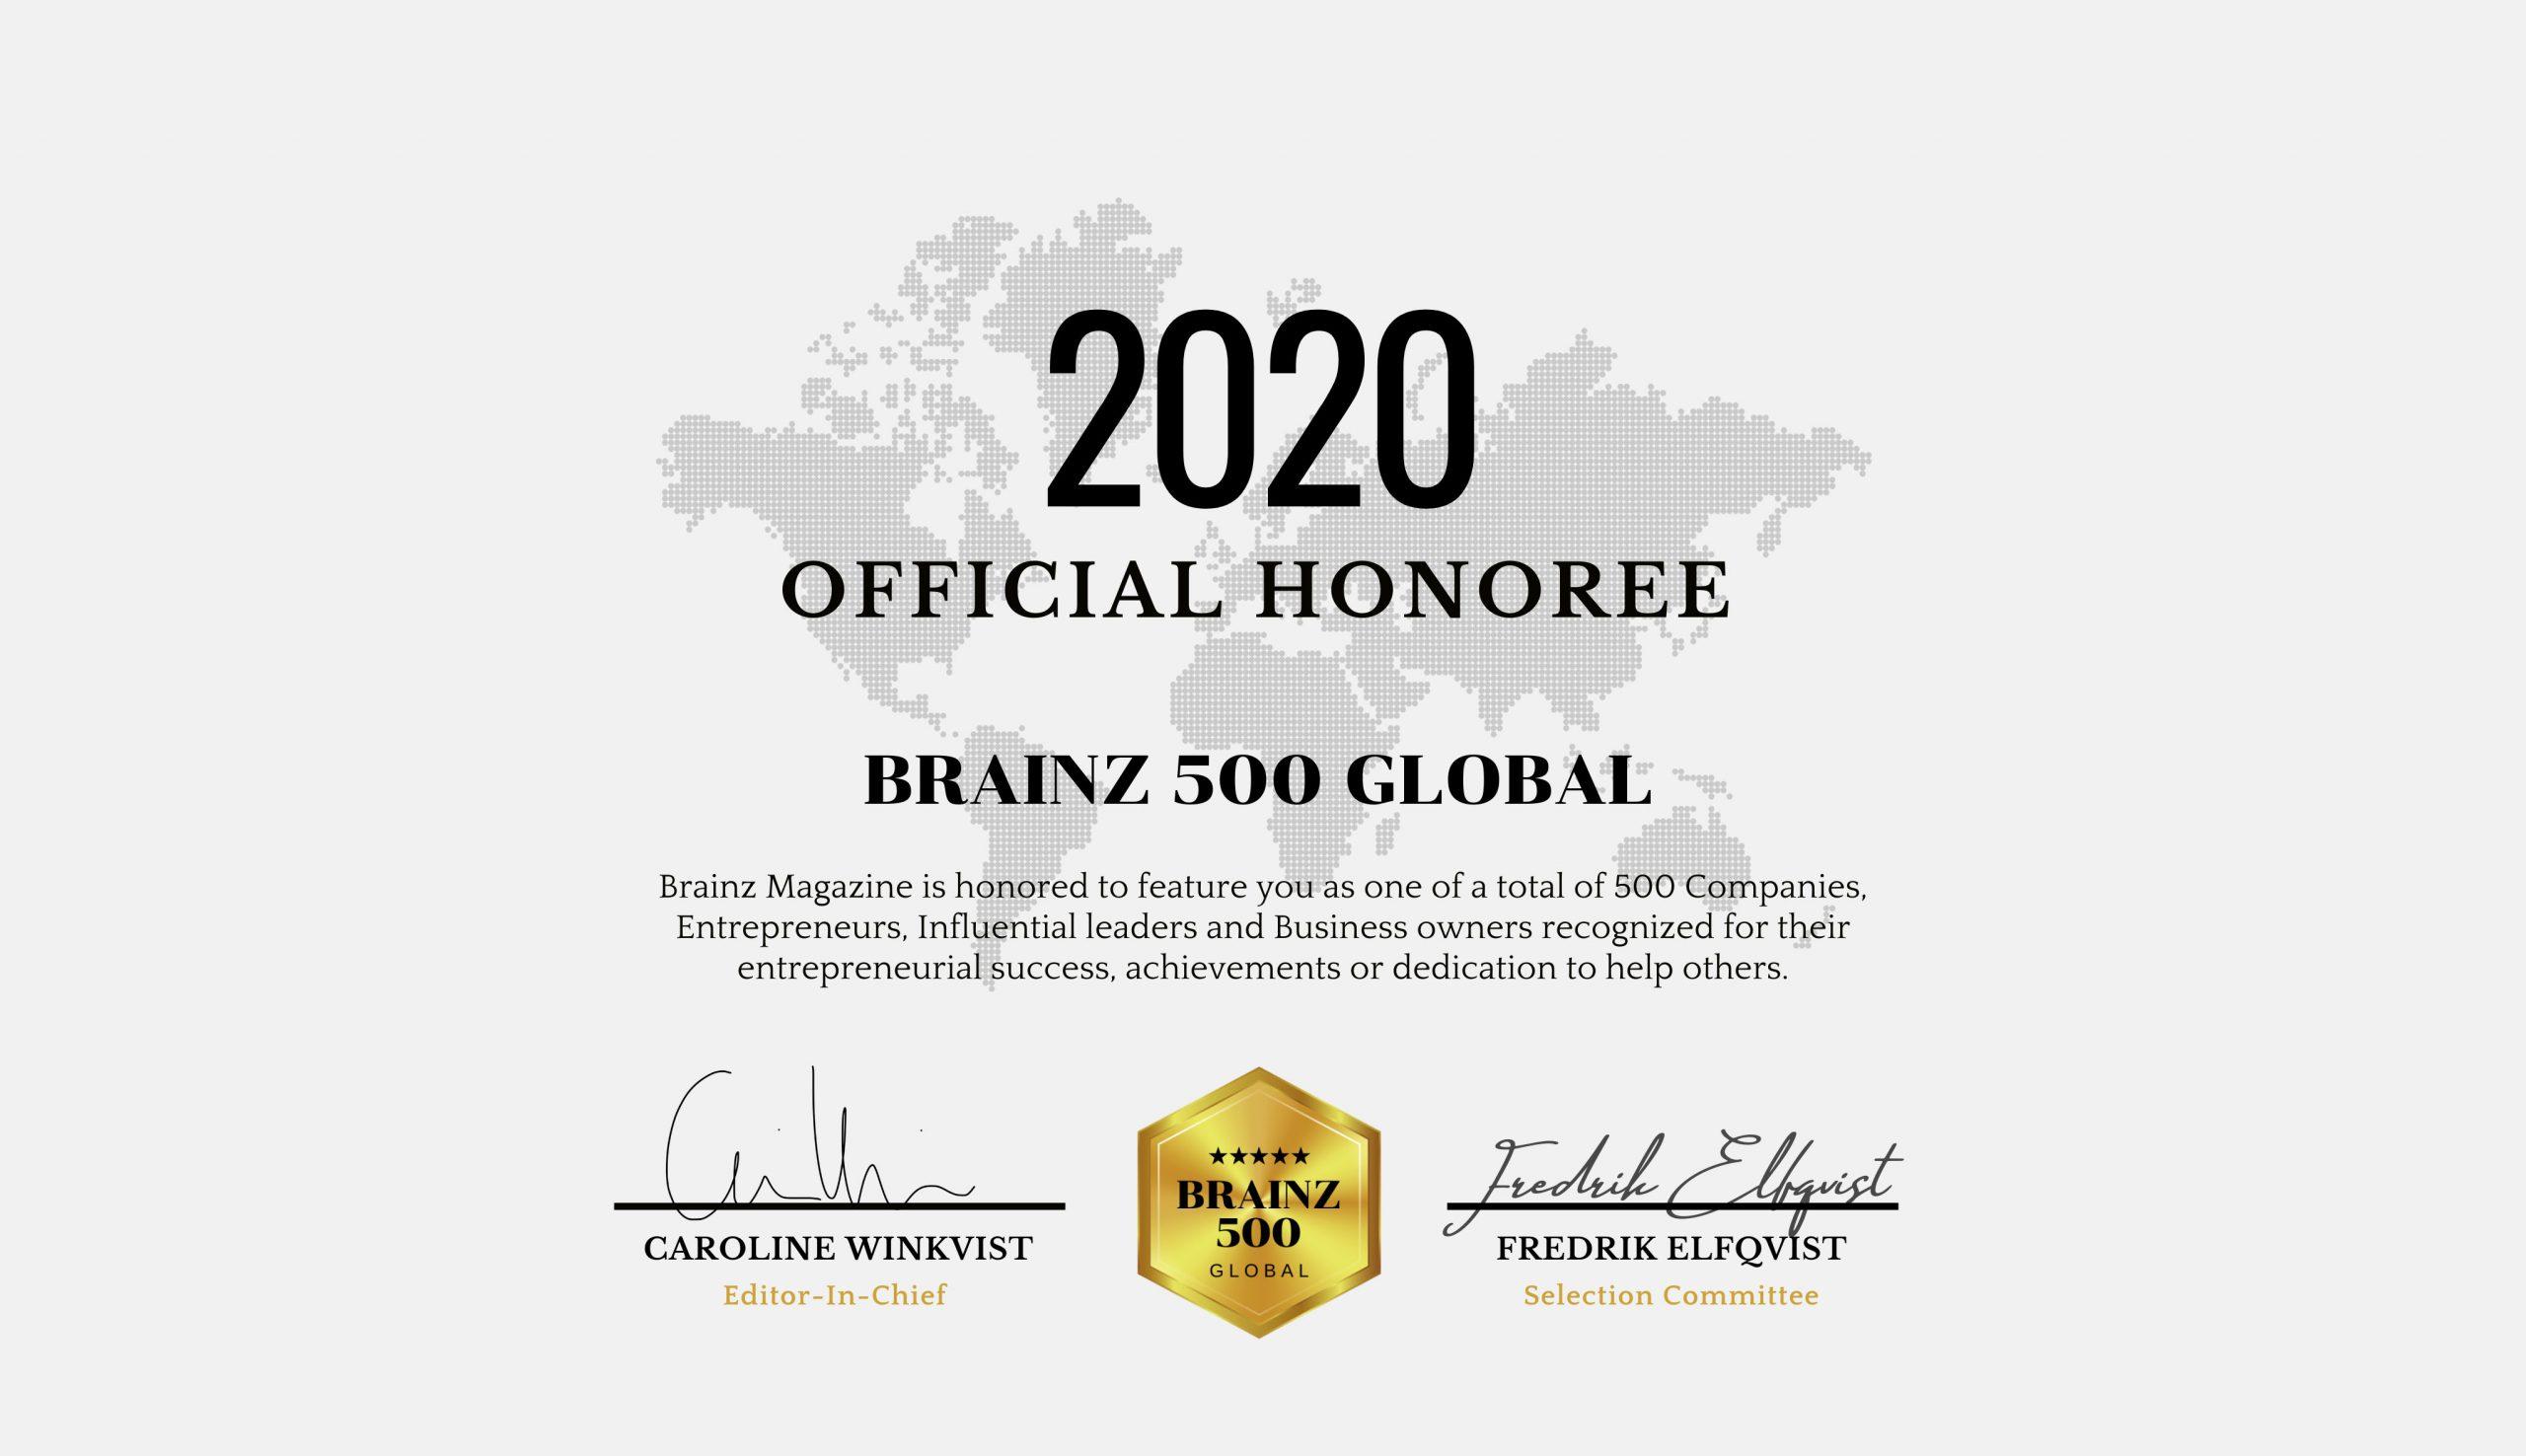 Stefan Eng on the Brainz 500 Global Honoree List, 2020